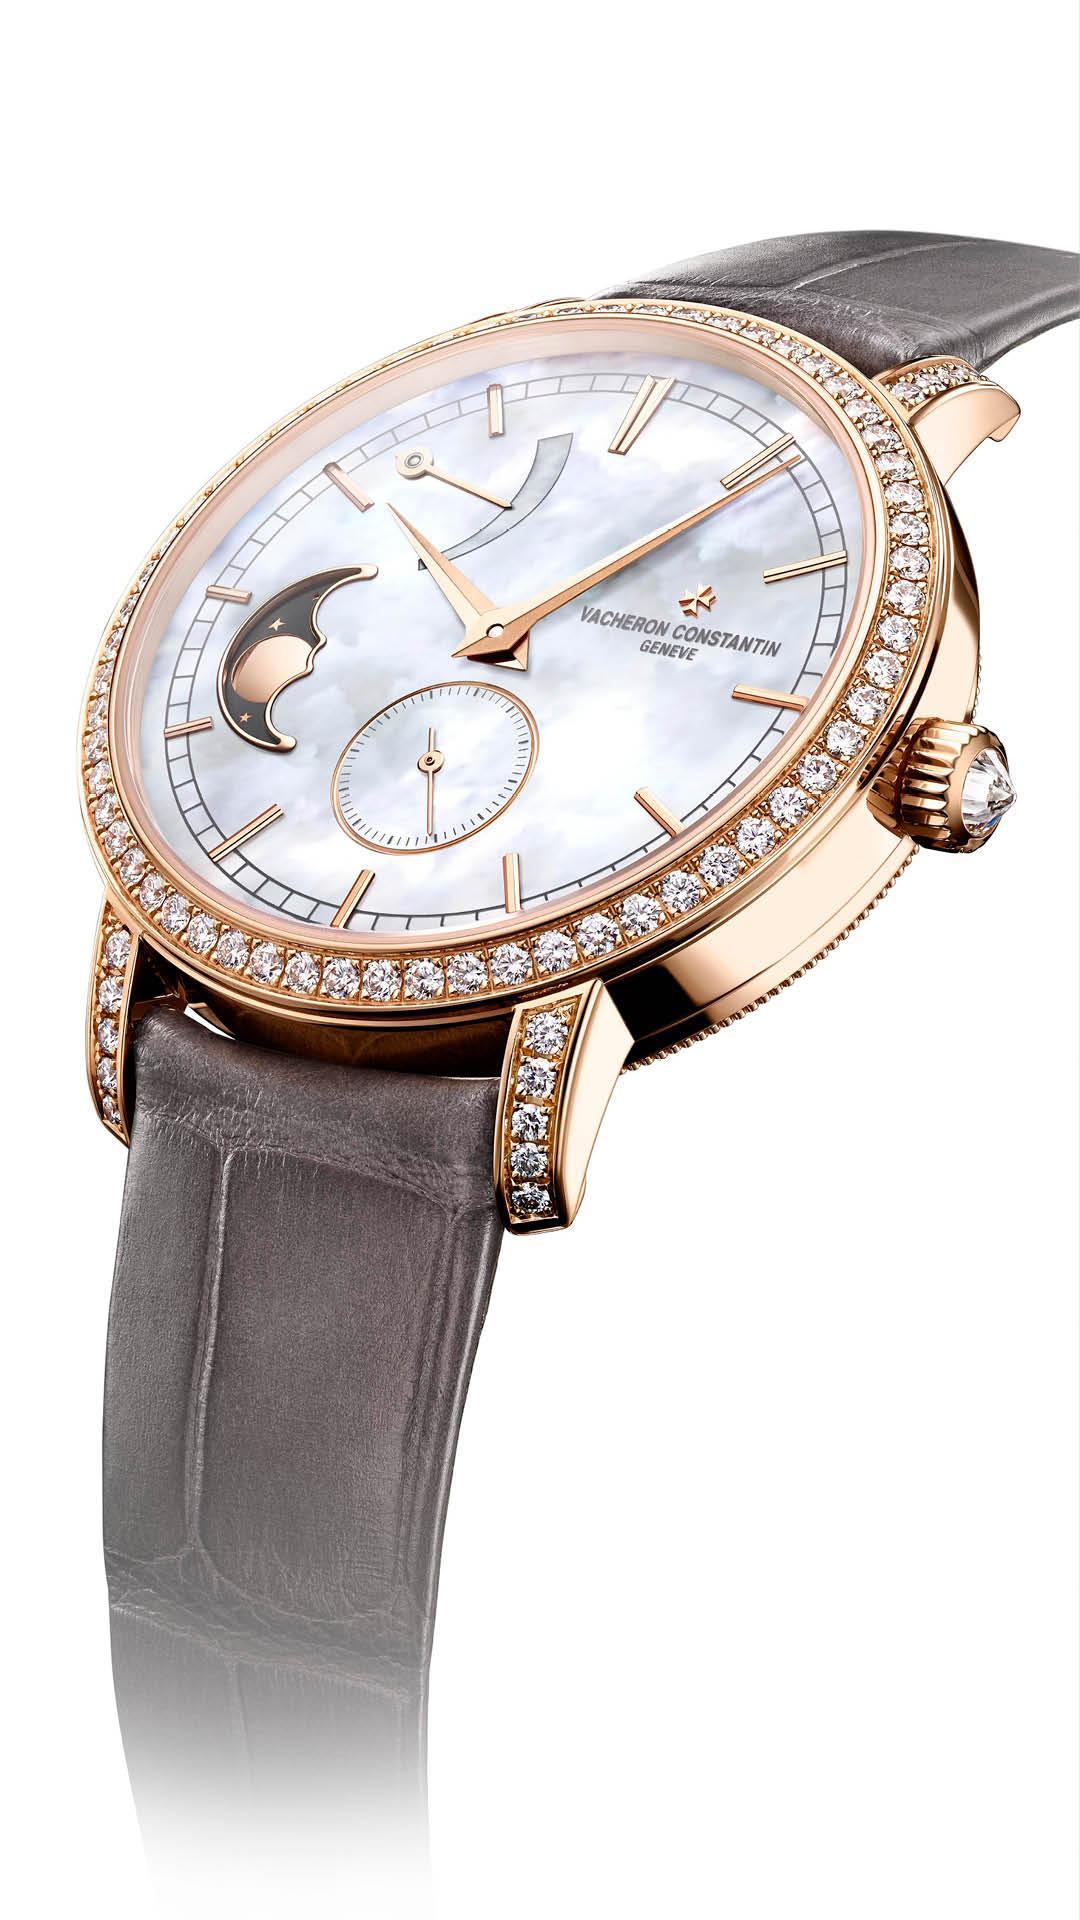 Vacheron Constantin Traditionelle Moon Phase Timepiece